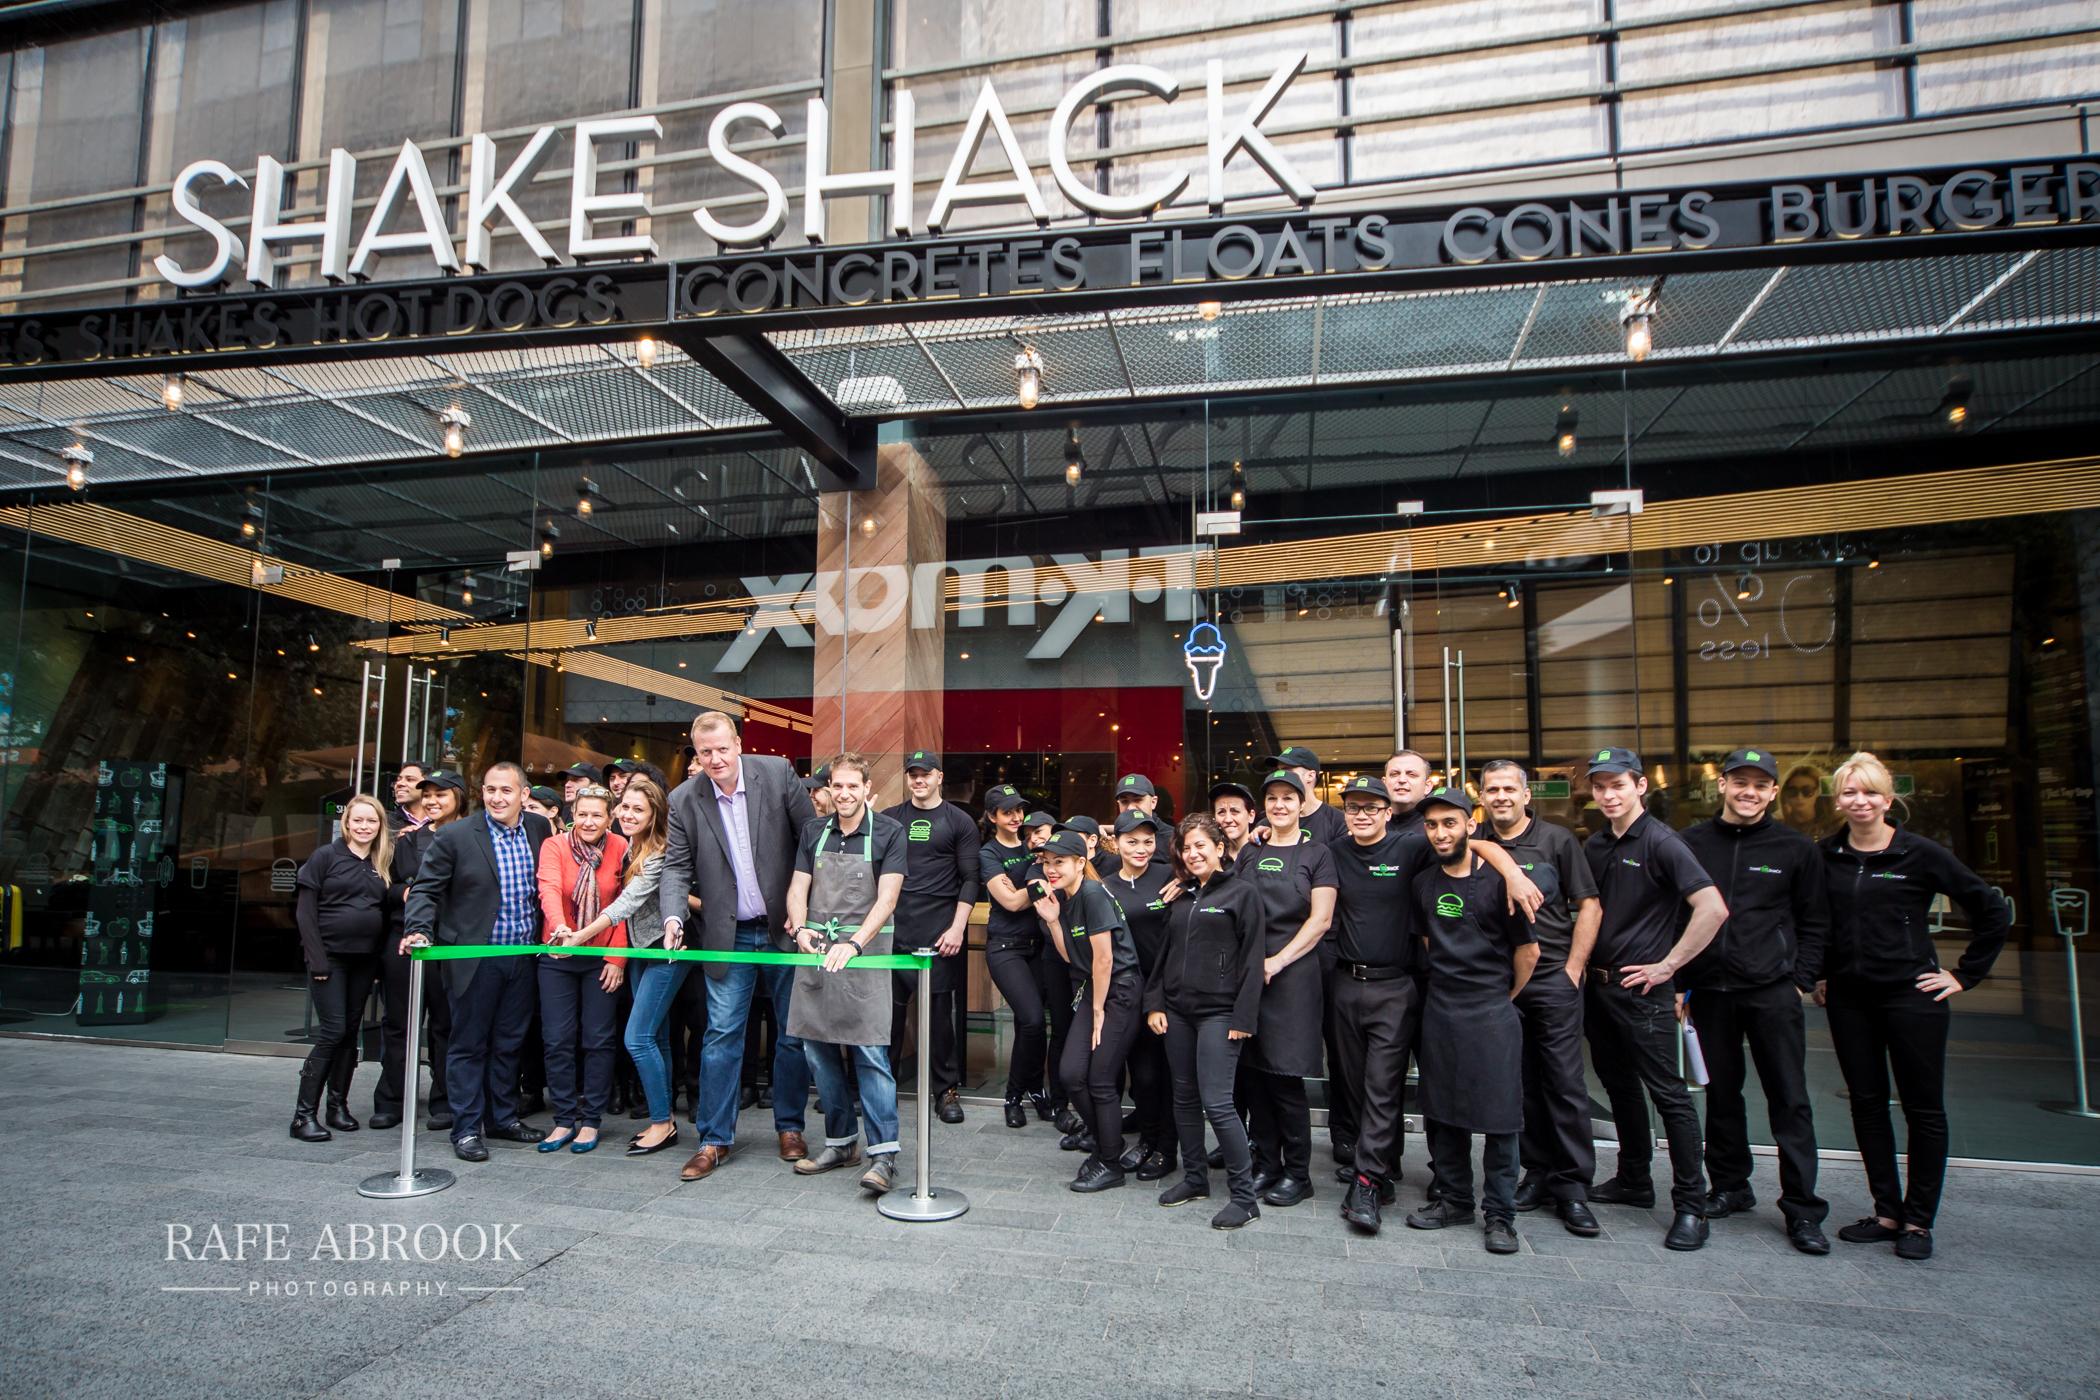 shake shack stratford city westfield opening 19.5.15-2002.jpg